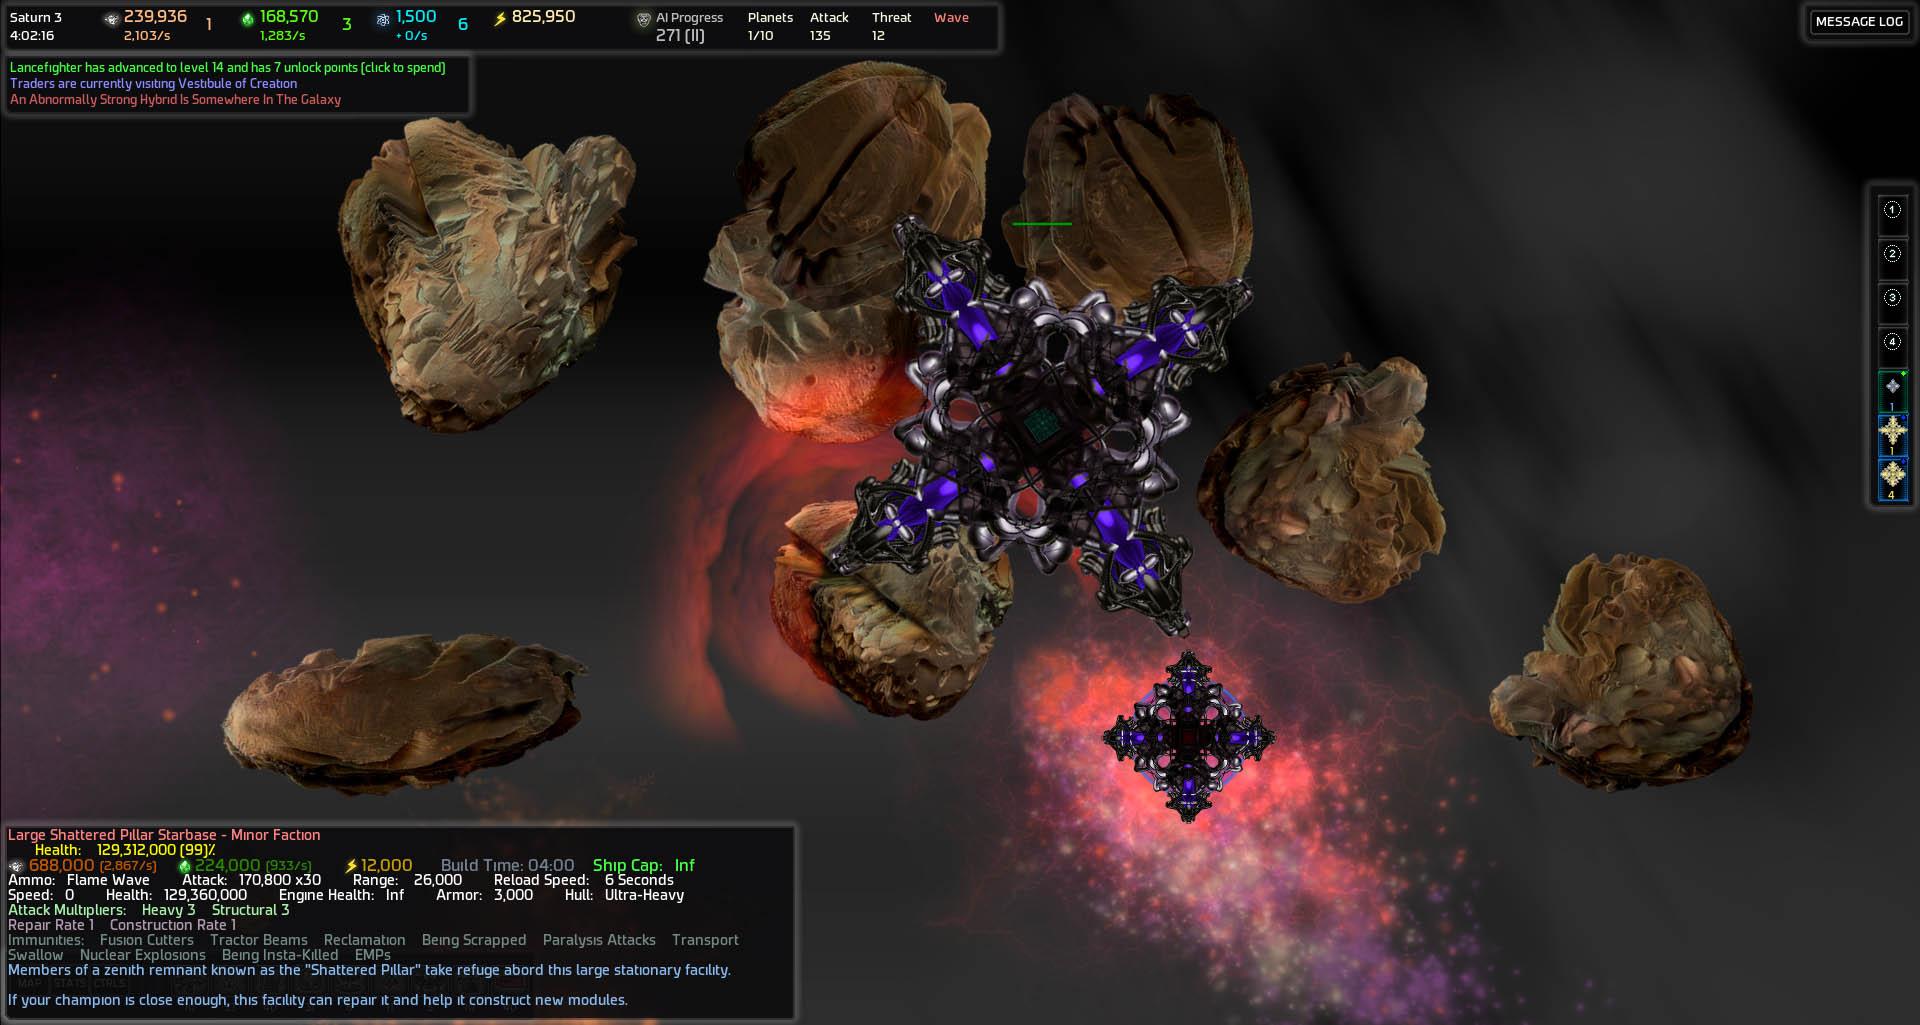 Nebula Scenario Shattered Pillar